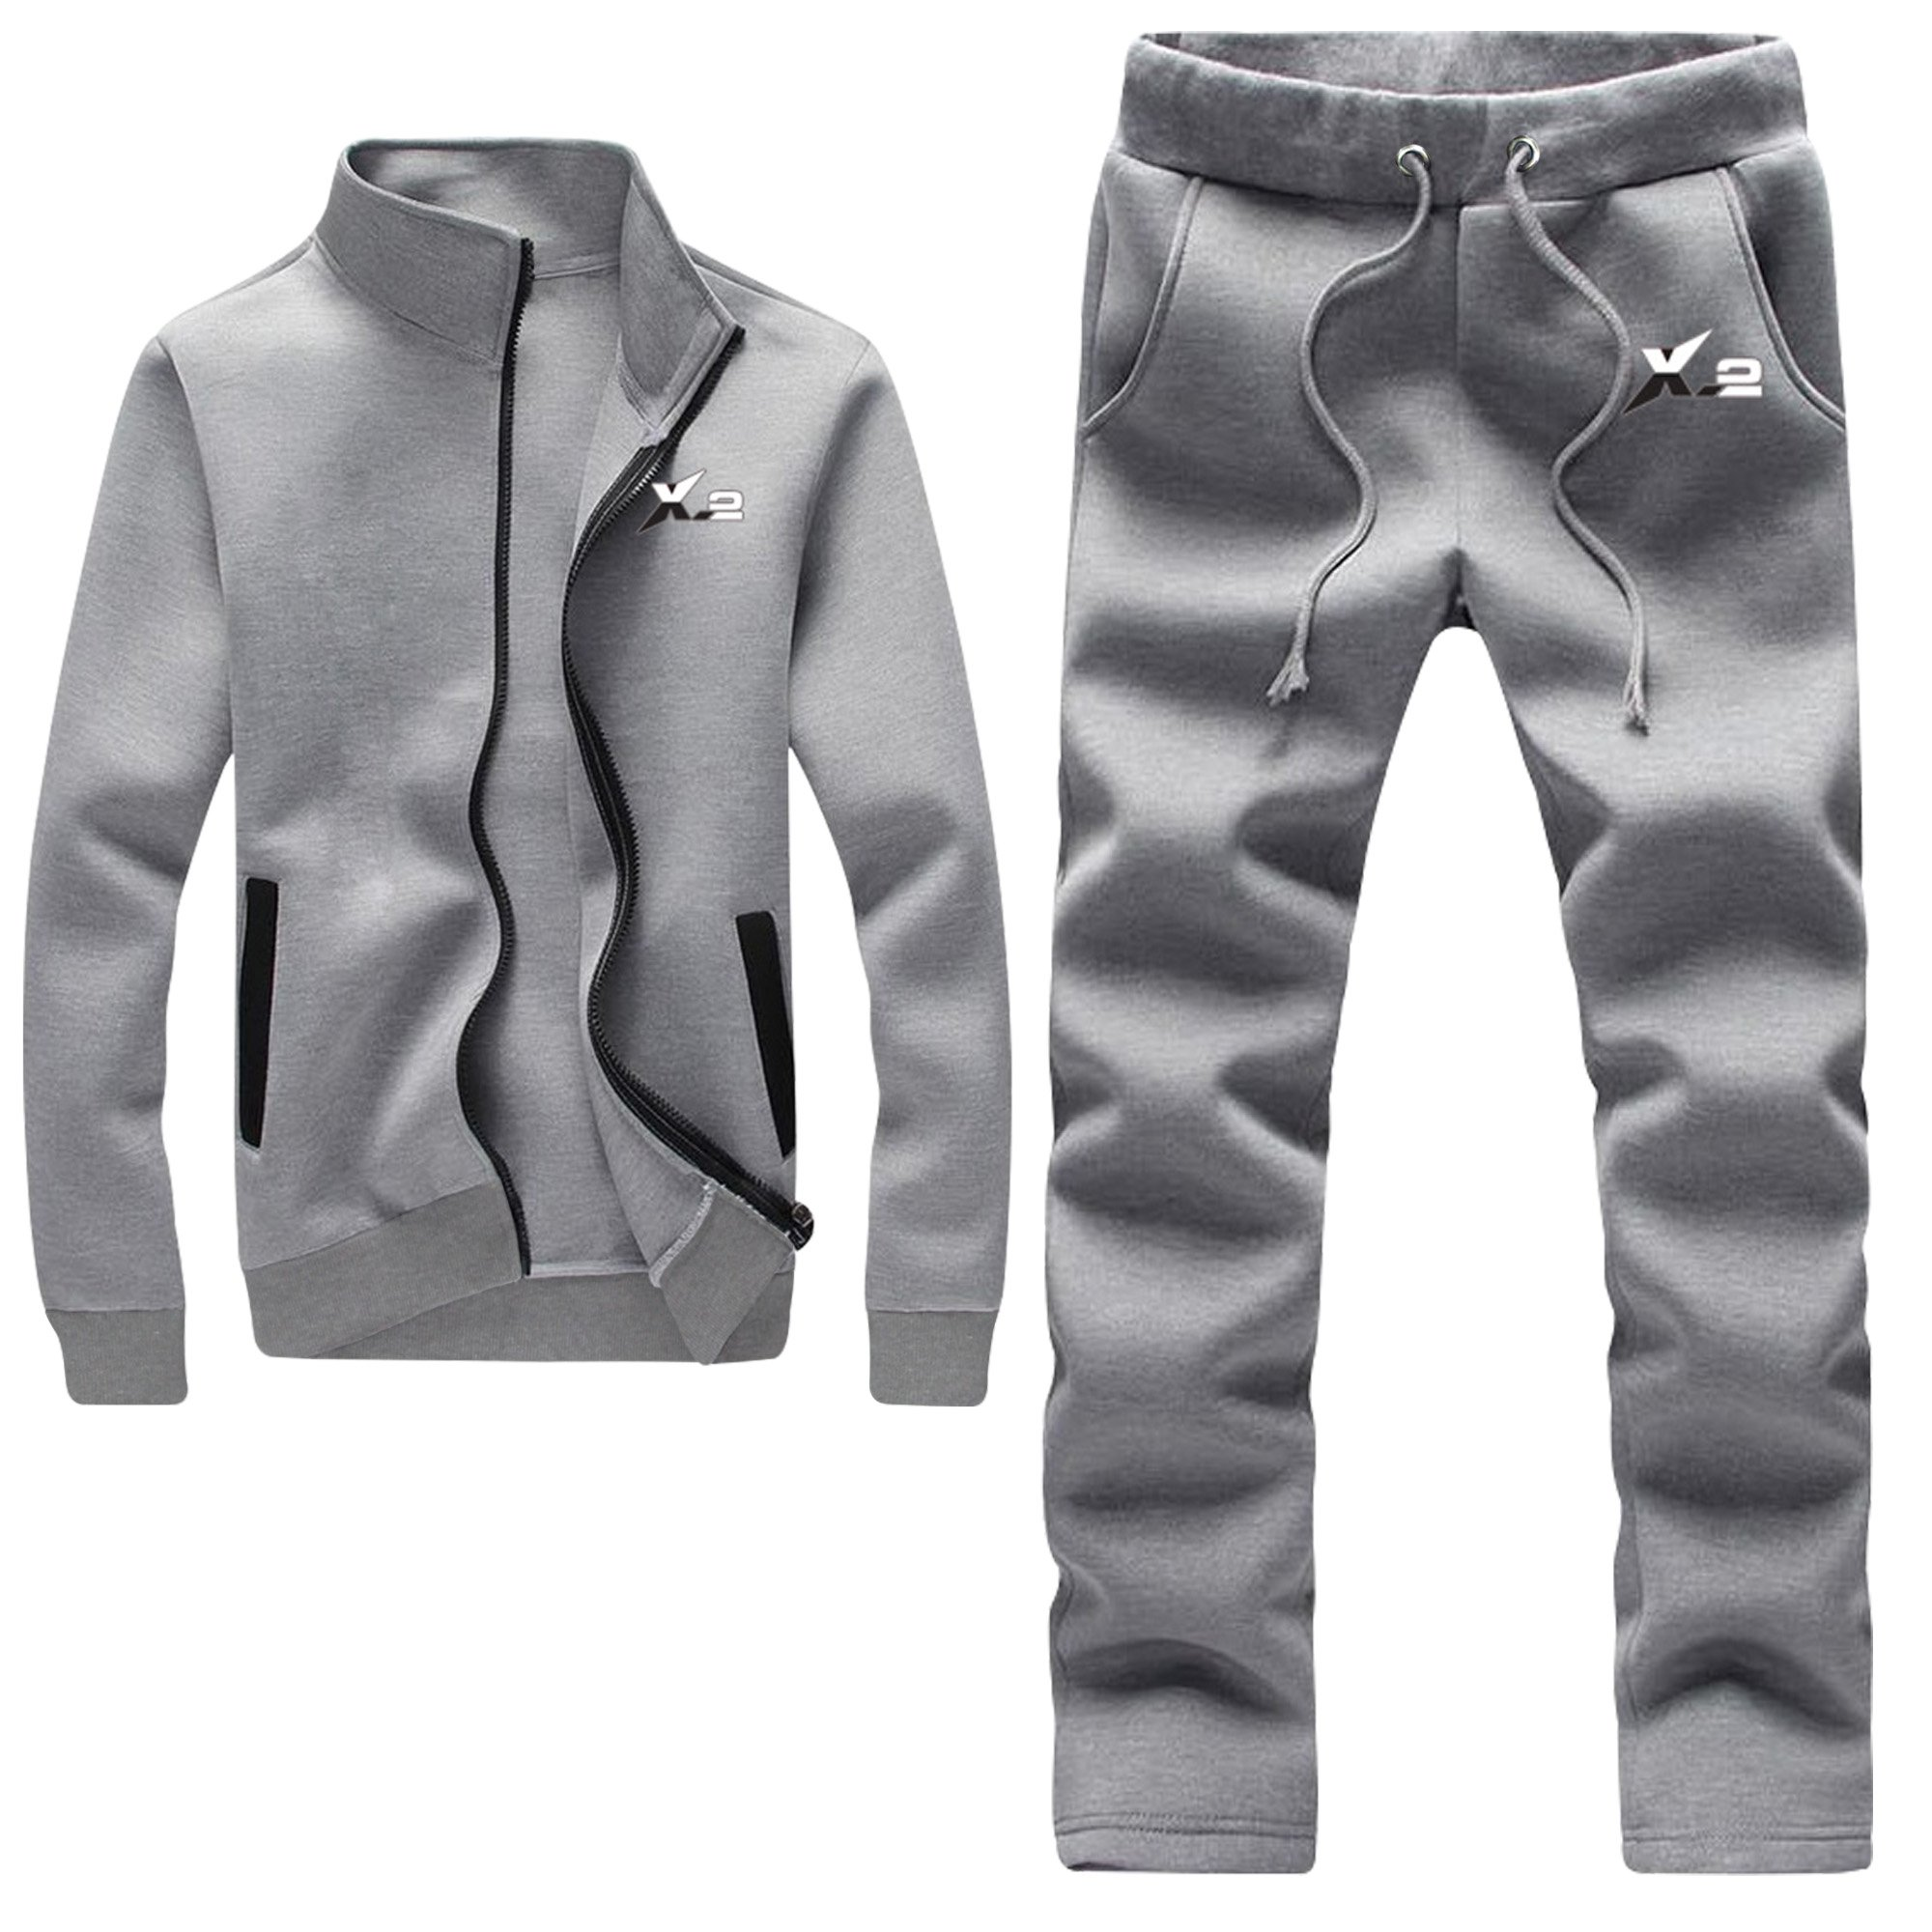 X-2 Athletic Full Zip Fleece Tracksuit Jogging Sweatsuit Activewear Gray XL by X-2